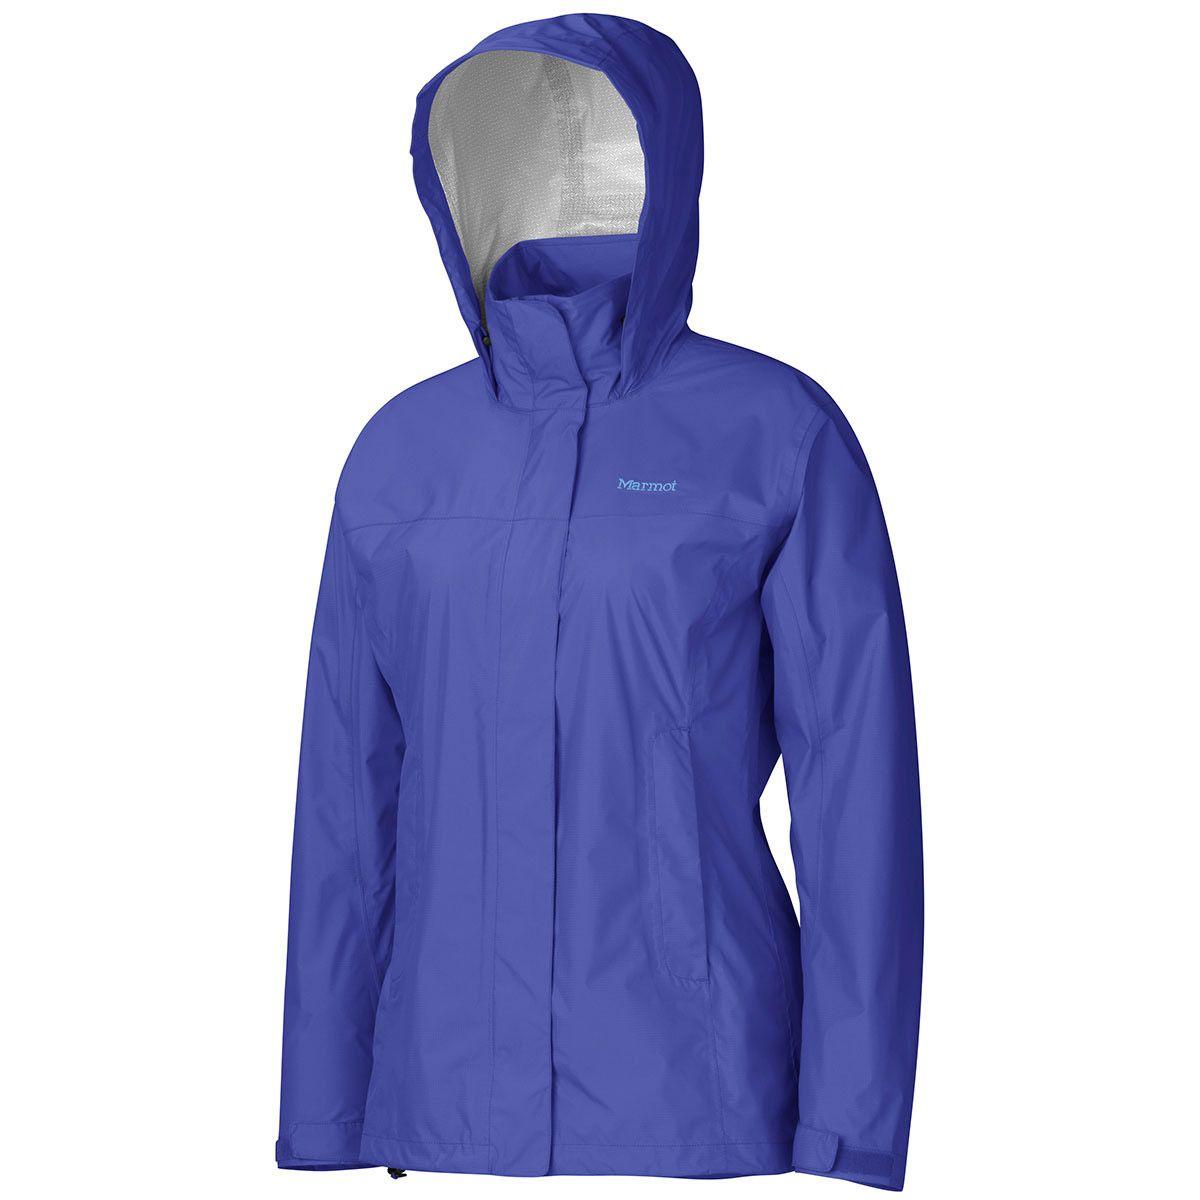 Marmot Waterproof PreCip Jacket